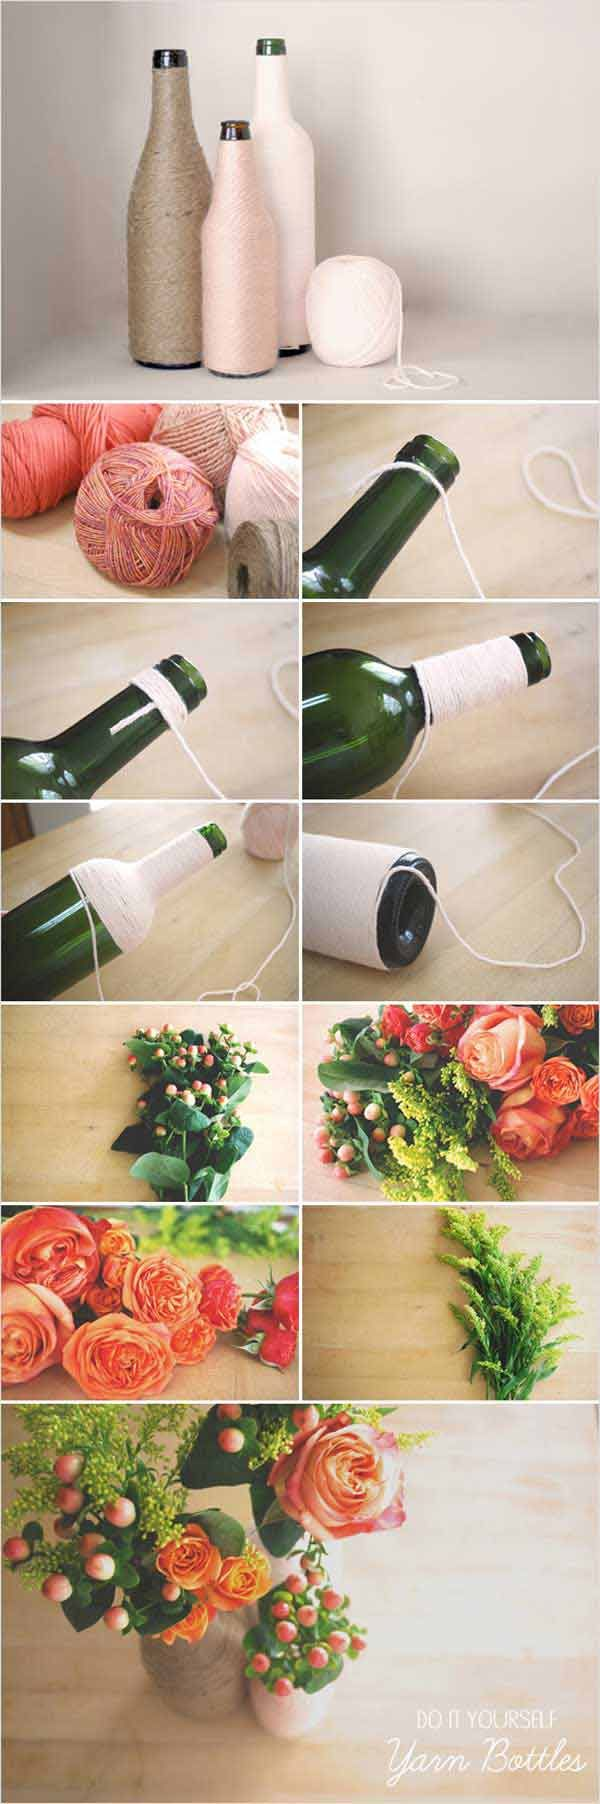 DIY vase avec du baker twine #bakertwine #wedding #vase #flowers #bottle #pinkandcoral